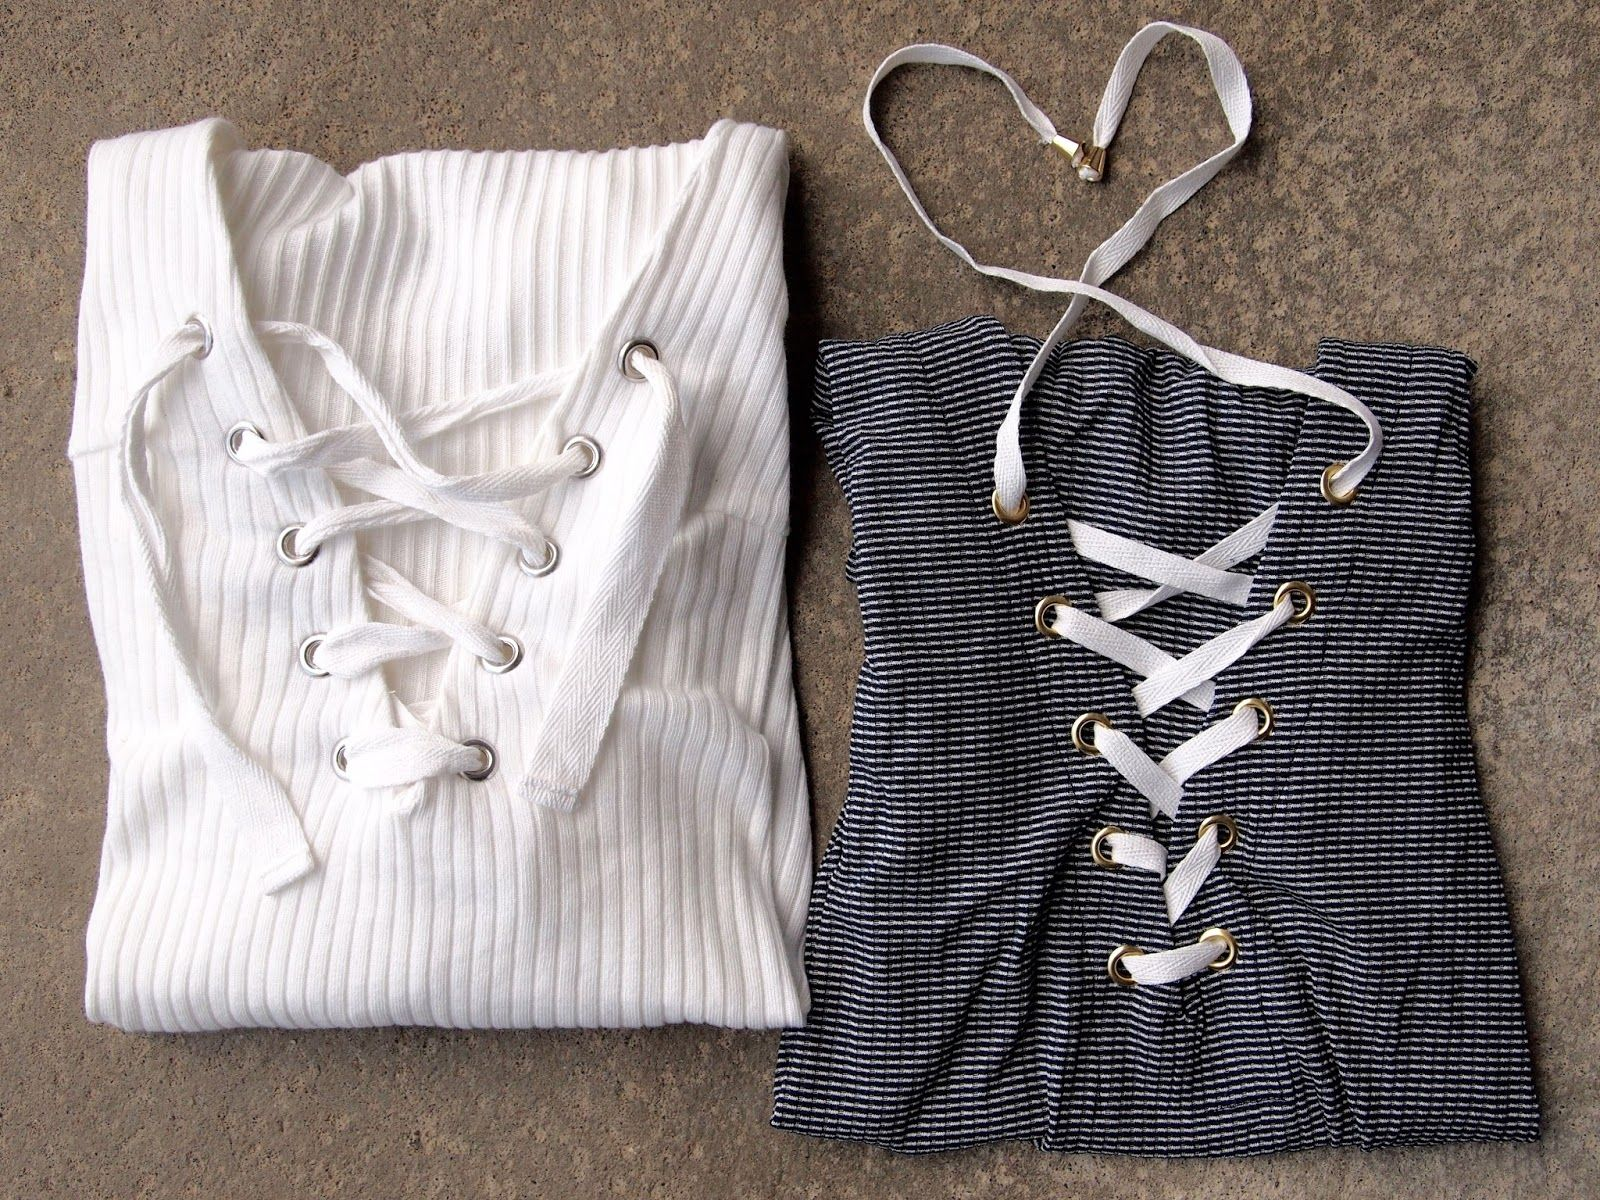 Ladybirds Nest Gina Tricot Elma Mija Top snøredetaljer lace